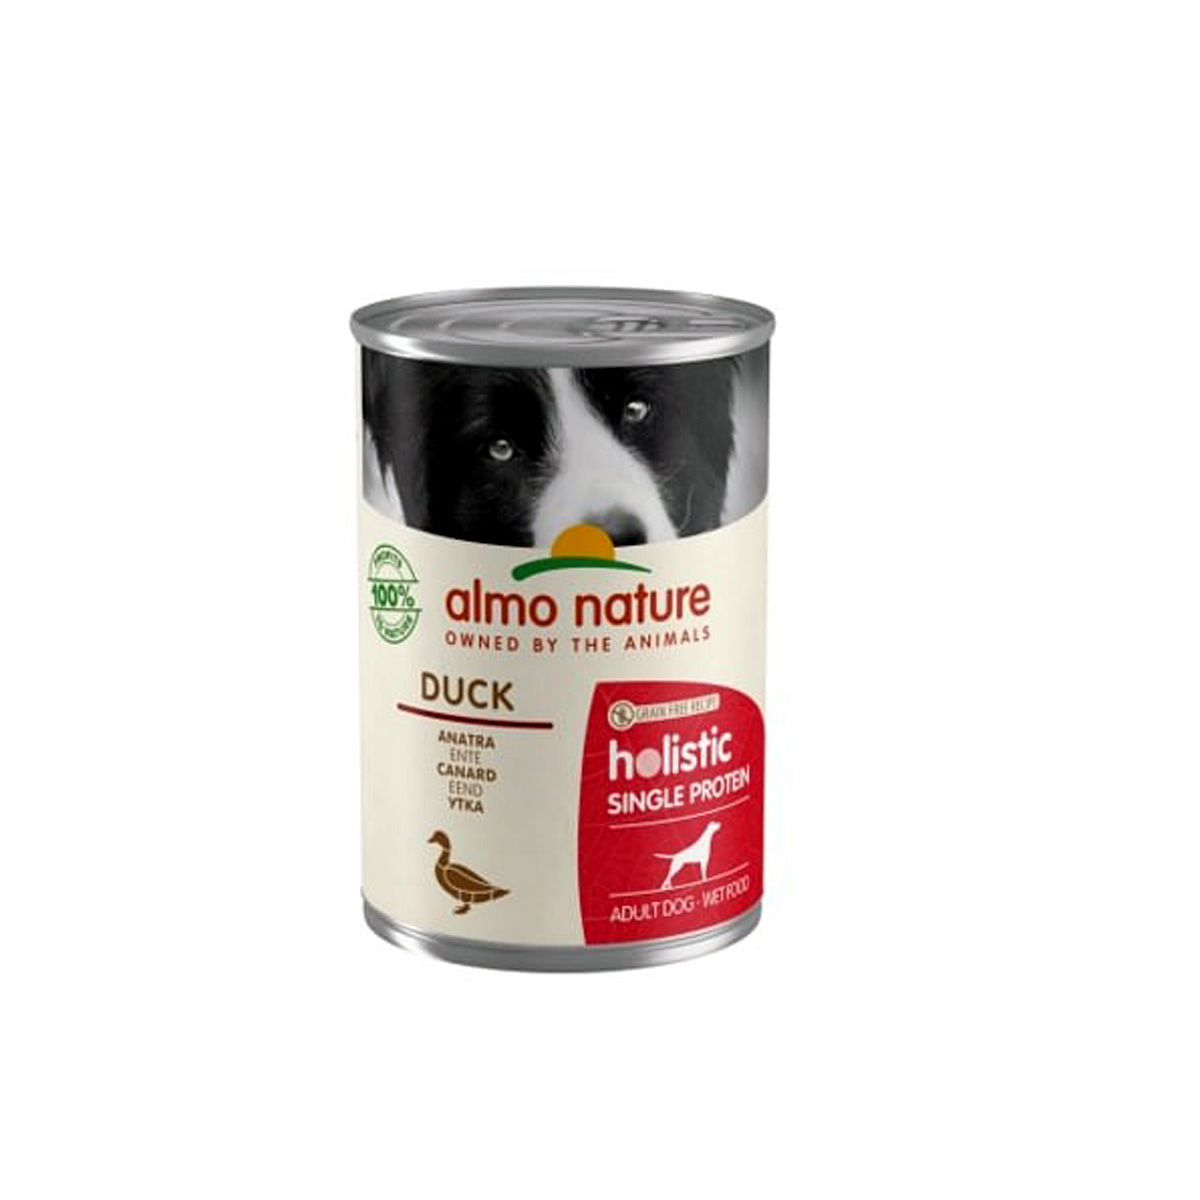 Almo Nature Holistic Single Protein